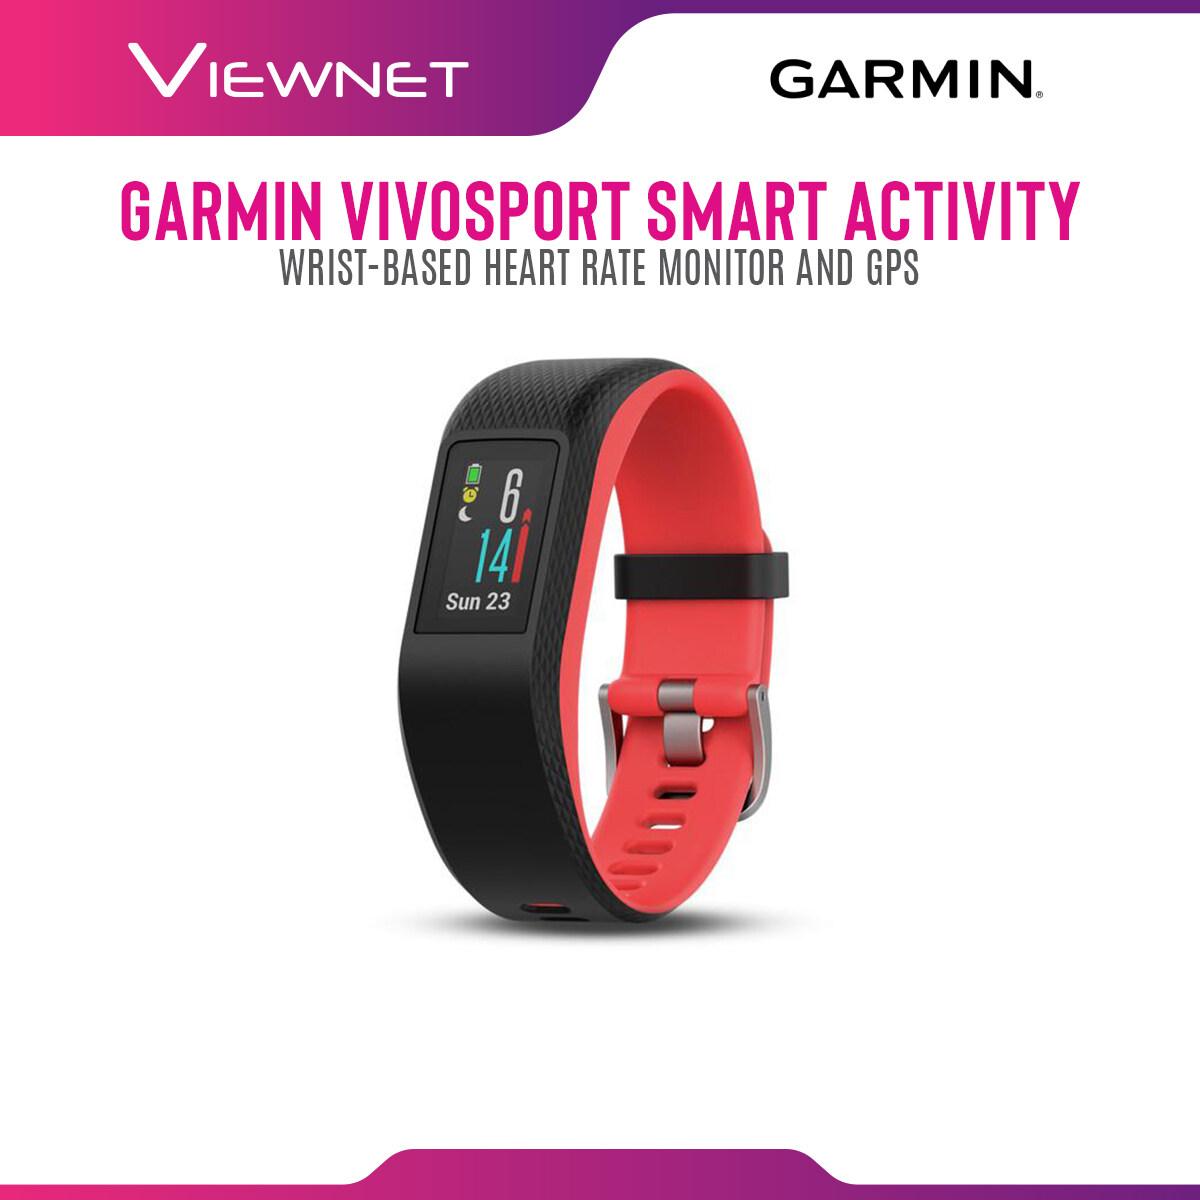 GARMIN VIVOSPORT SMART ACTIVITY TRACKER SMARTWATCH WITH WRIST-BASED HEART RATE MONITOR AND GPS (REGULAR) - SLATE /FUCHSIA FOCUS